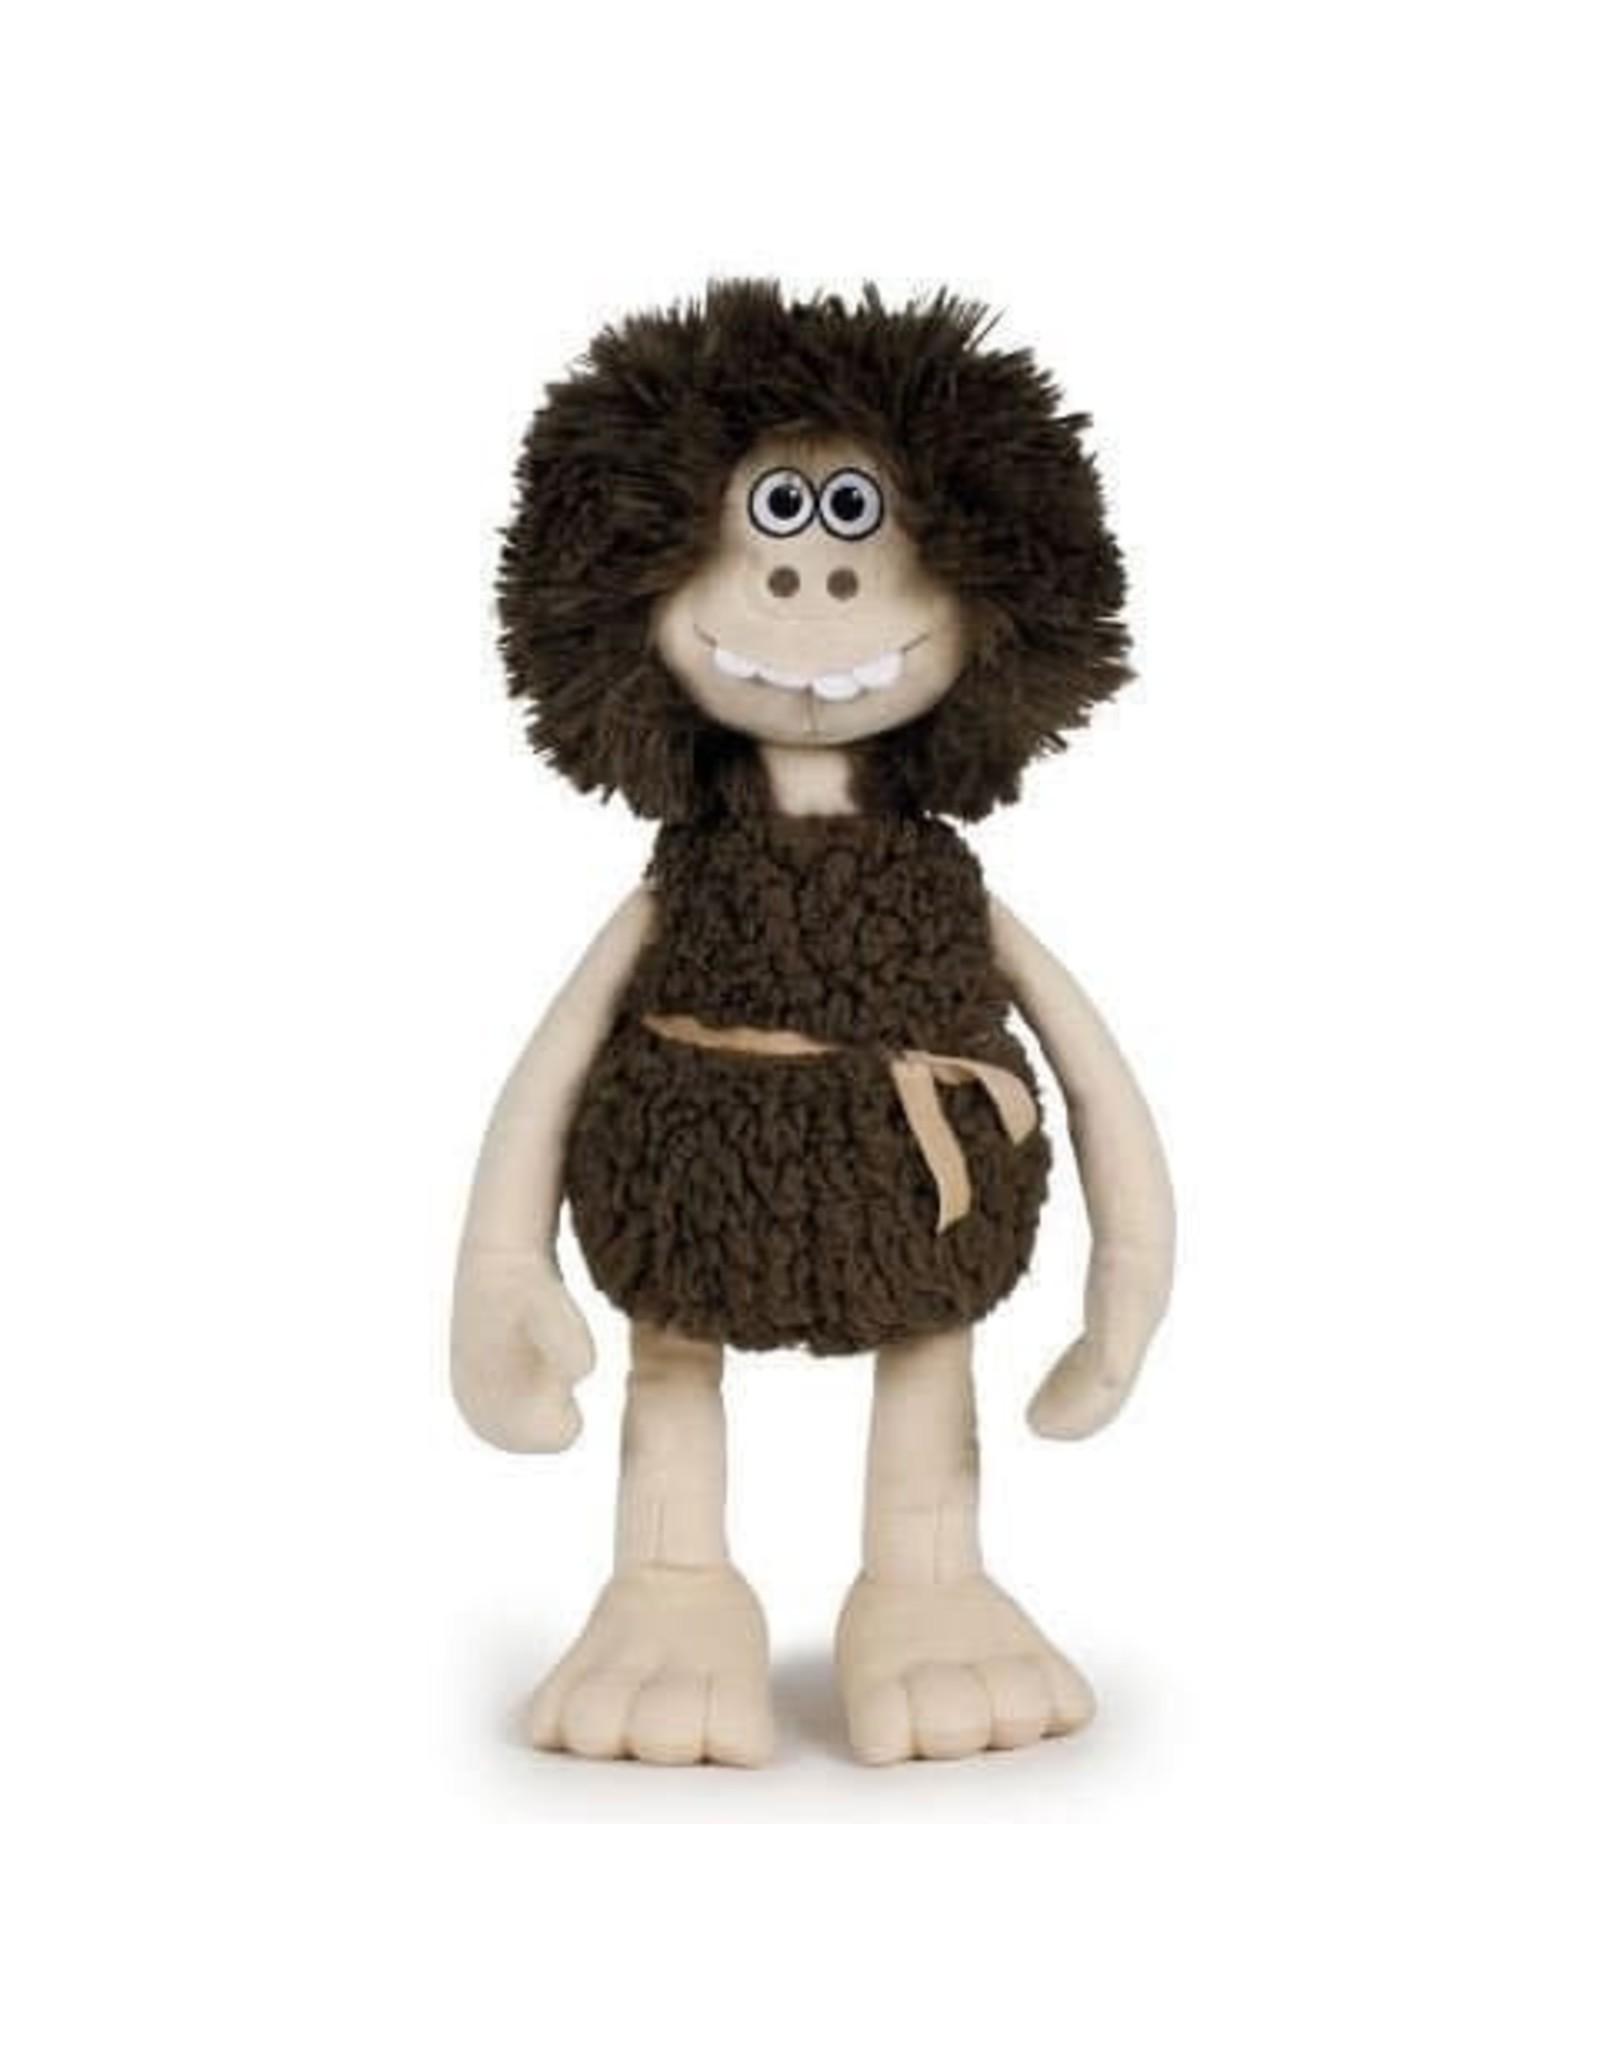 Early man Merchandise toys - Early Man Dug Plush doll